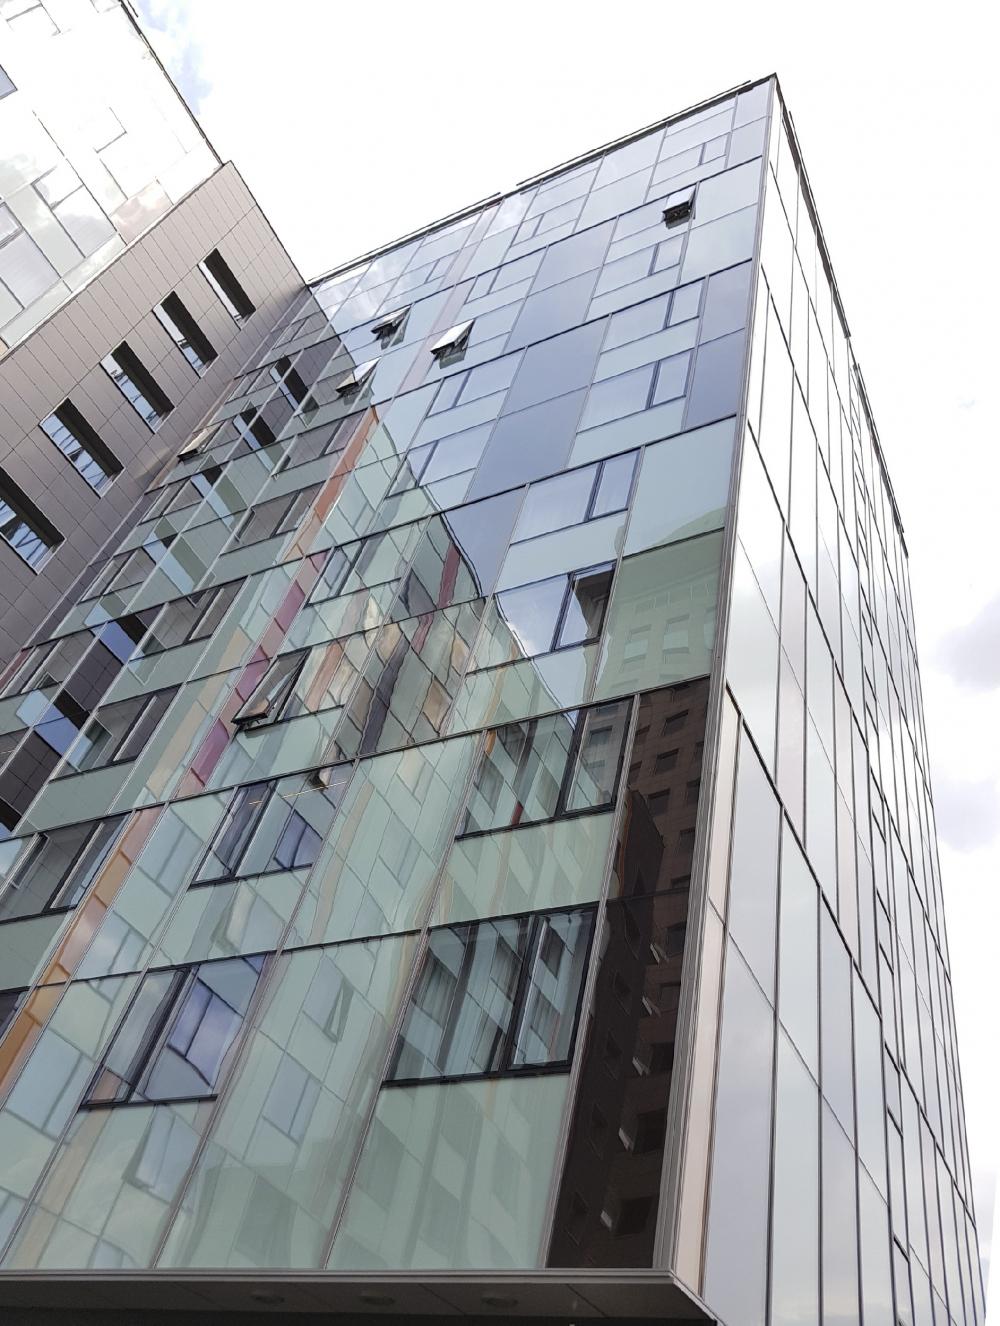 Holiday Inn Express Hotel on the Dubininskaya Street, Moscow<br>Copyright: Photograph © Ginzburg Architects